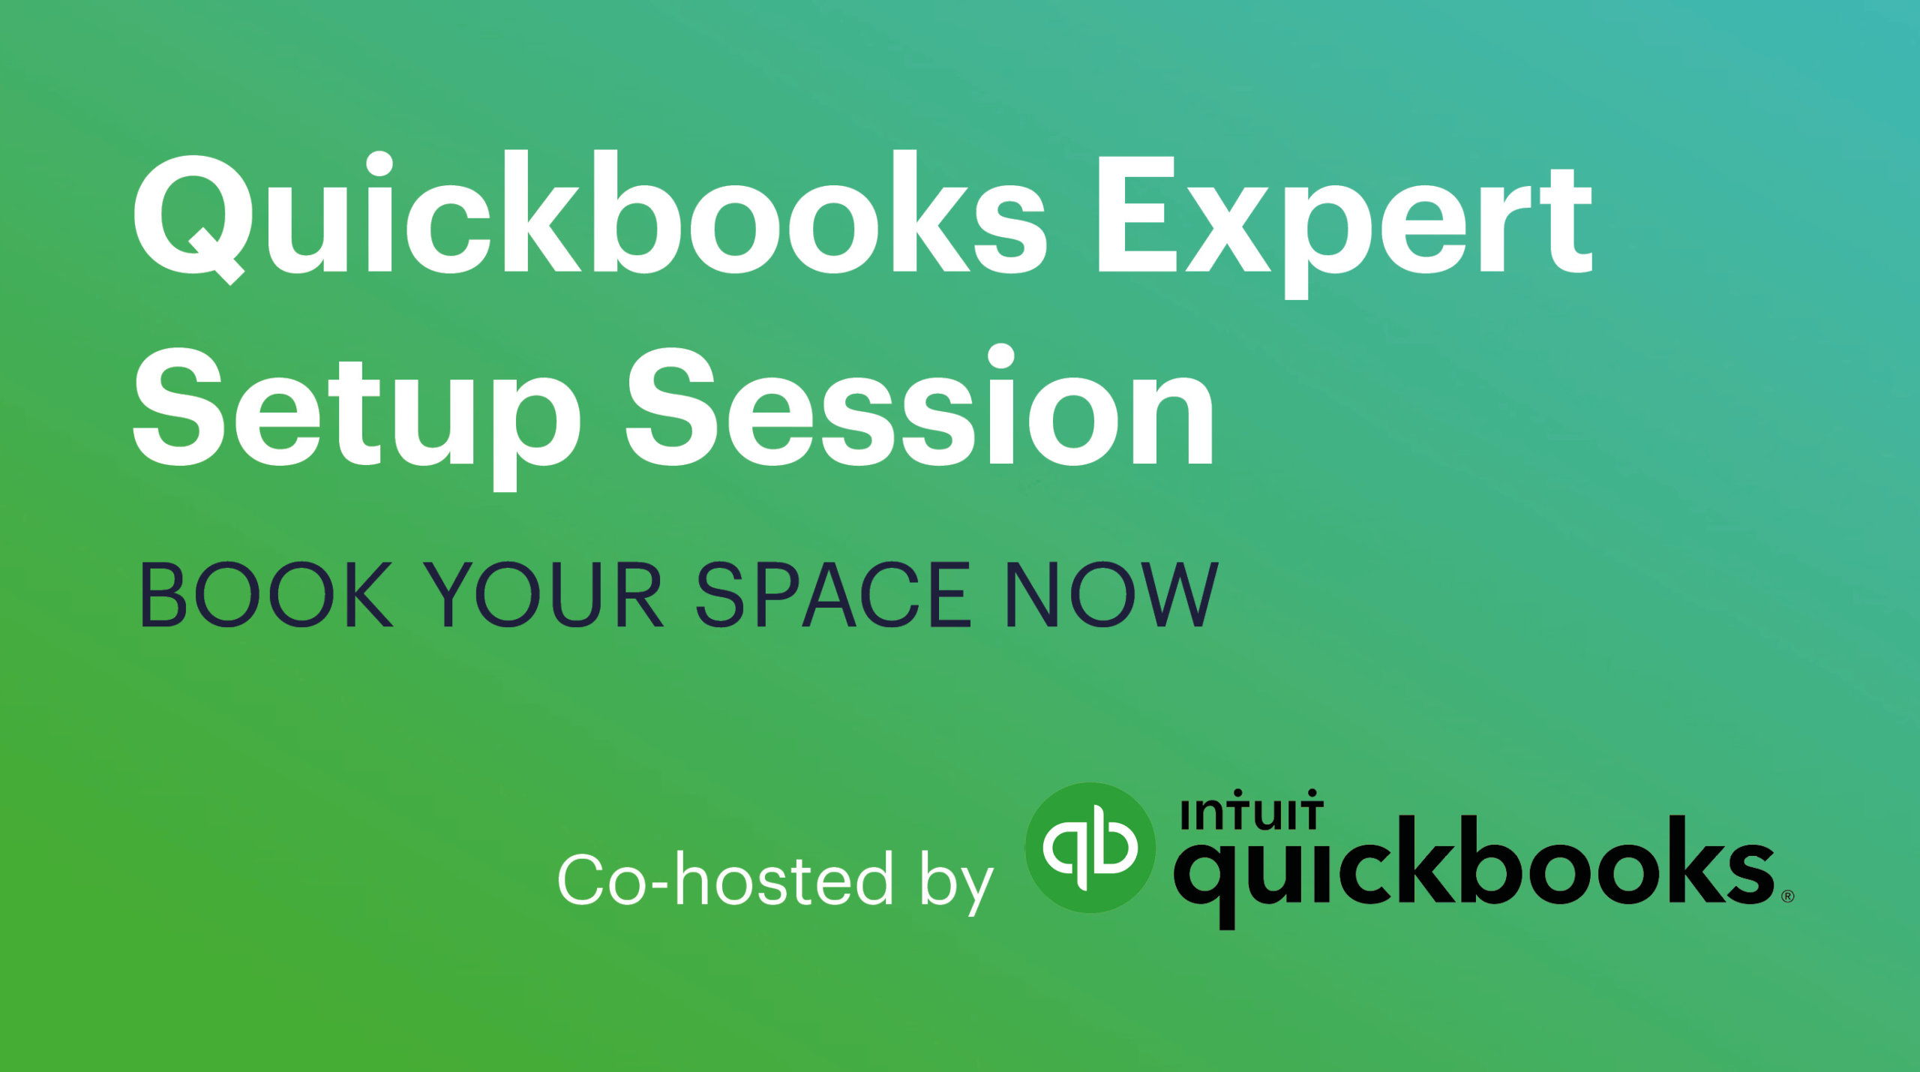 Quickbooks Expert Setup